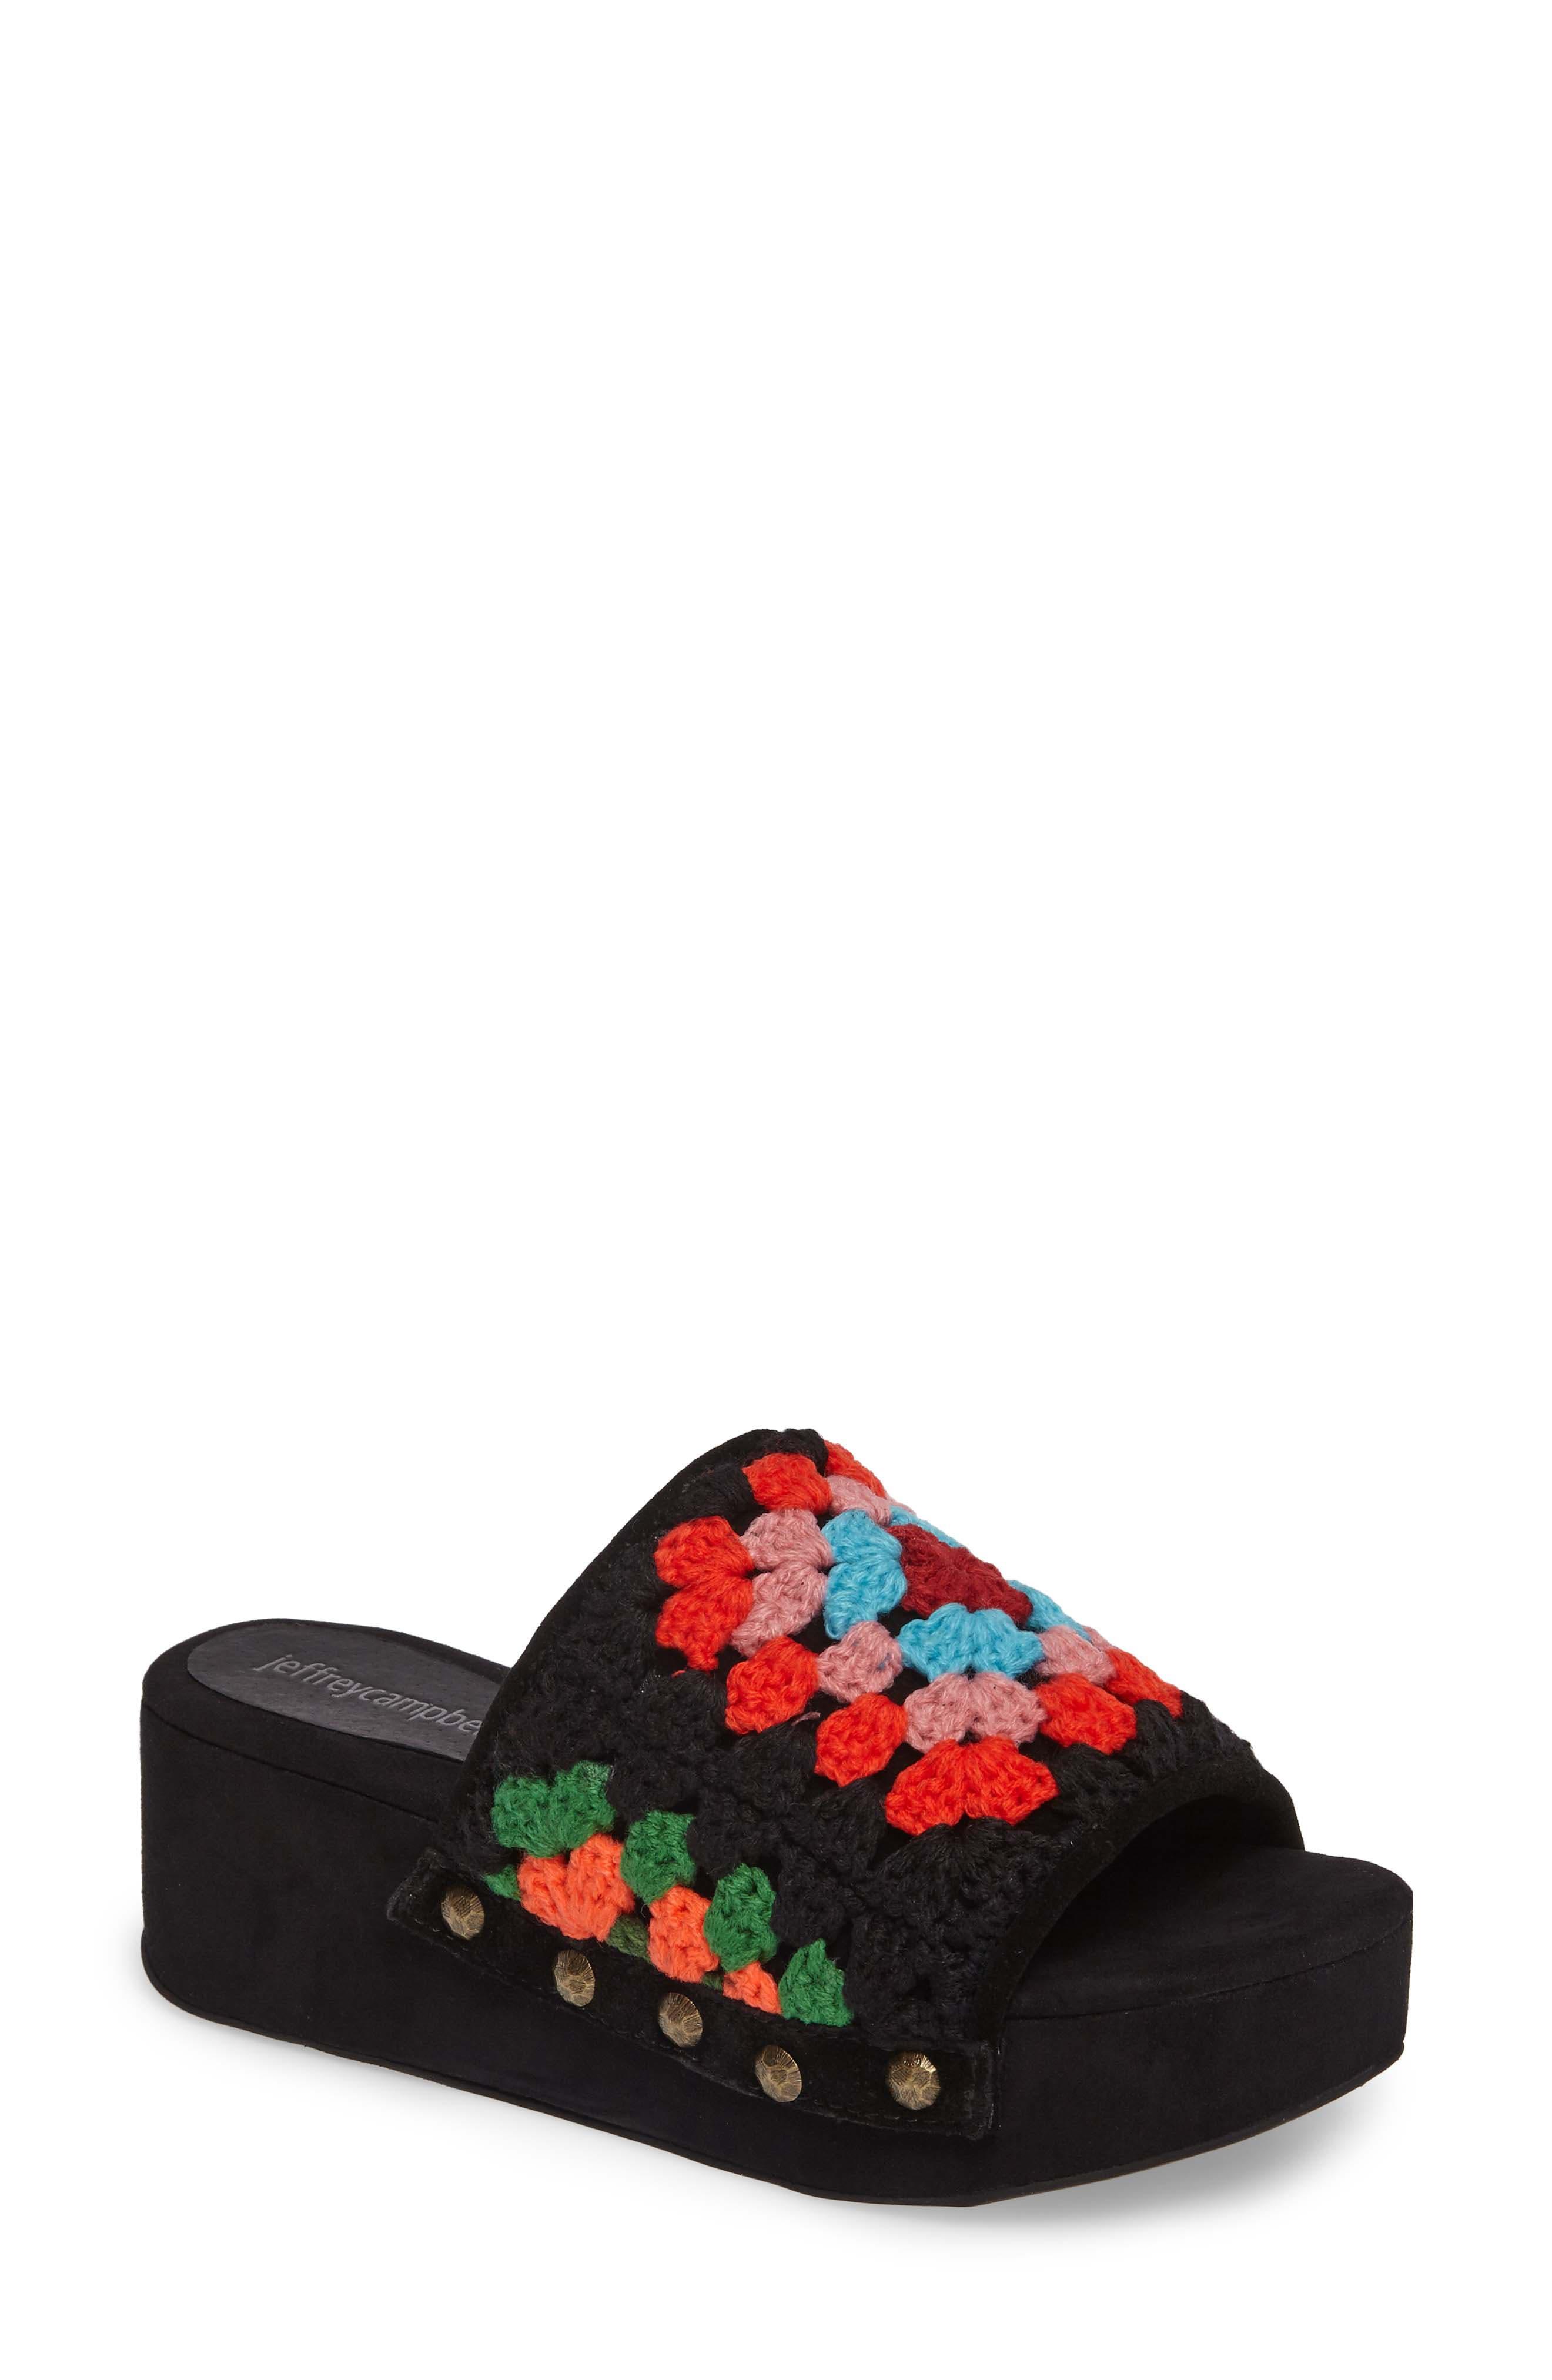 Nonna Crocheted Platform Slide Sandal,                         Main,                         color,